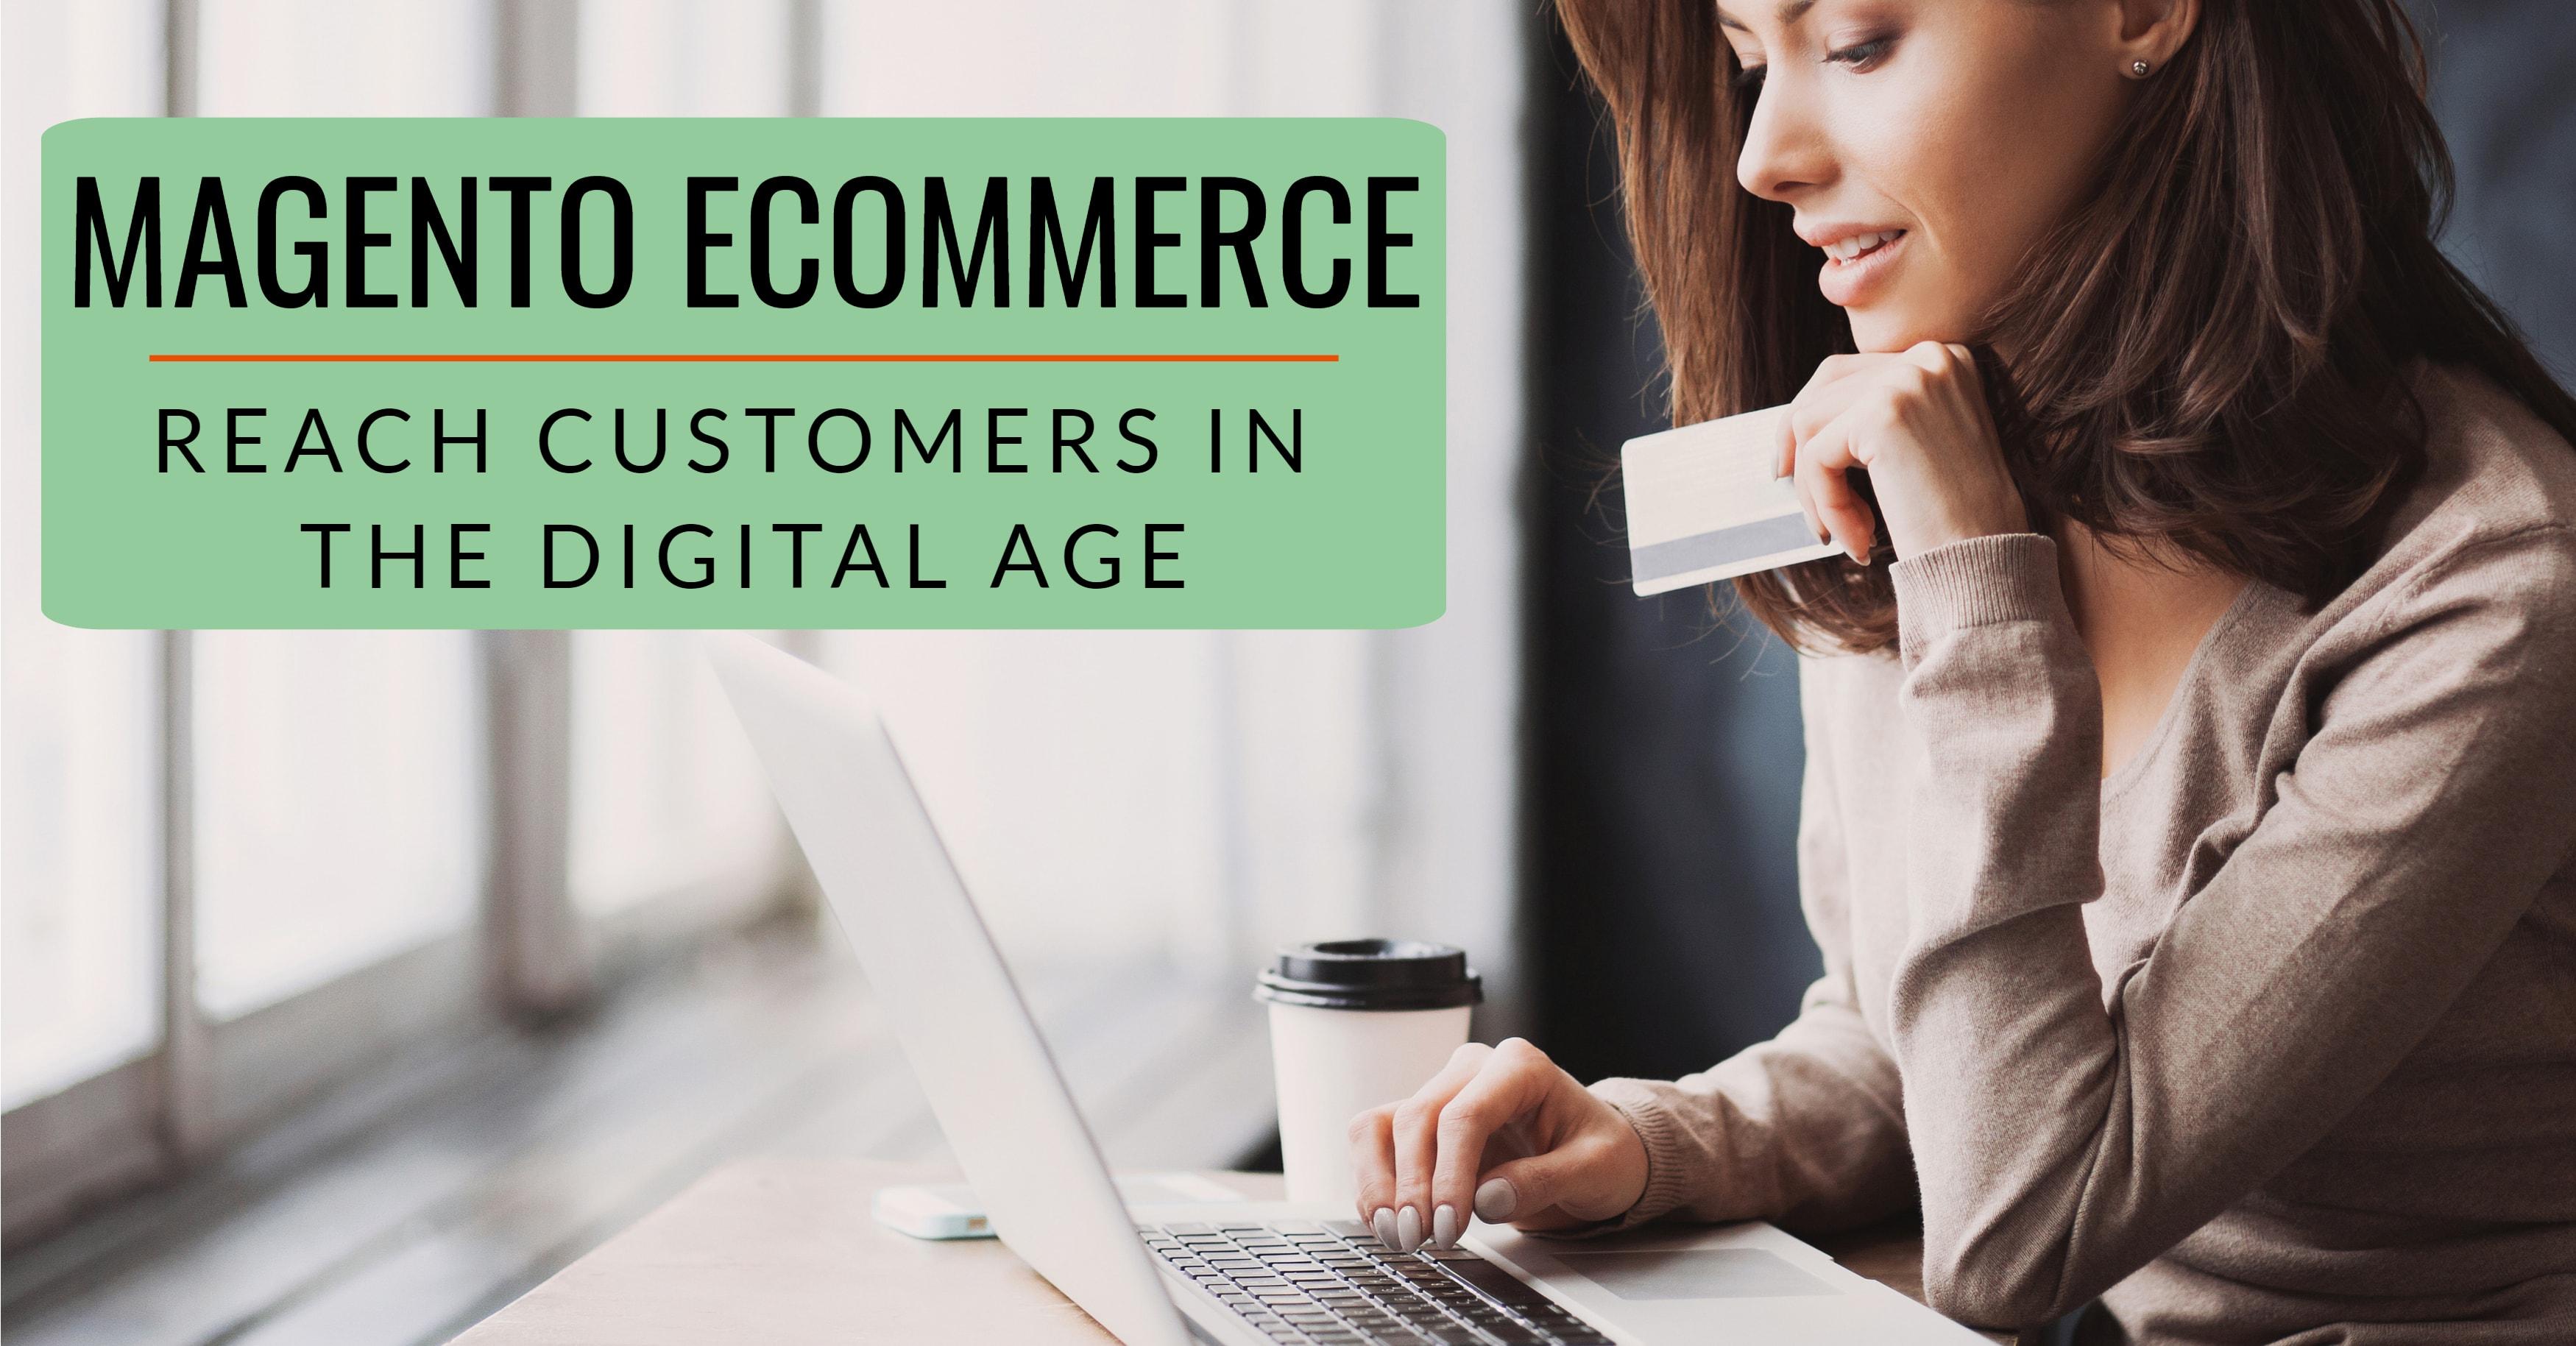 Magento eCommerce Customers